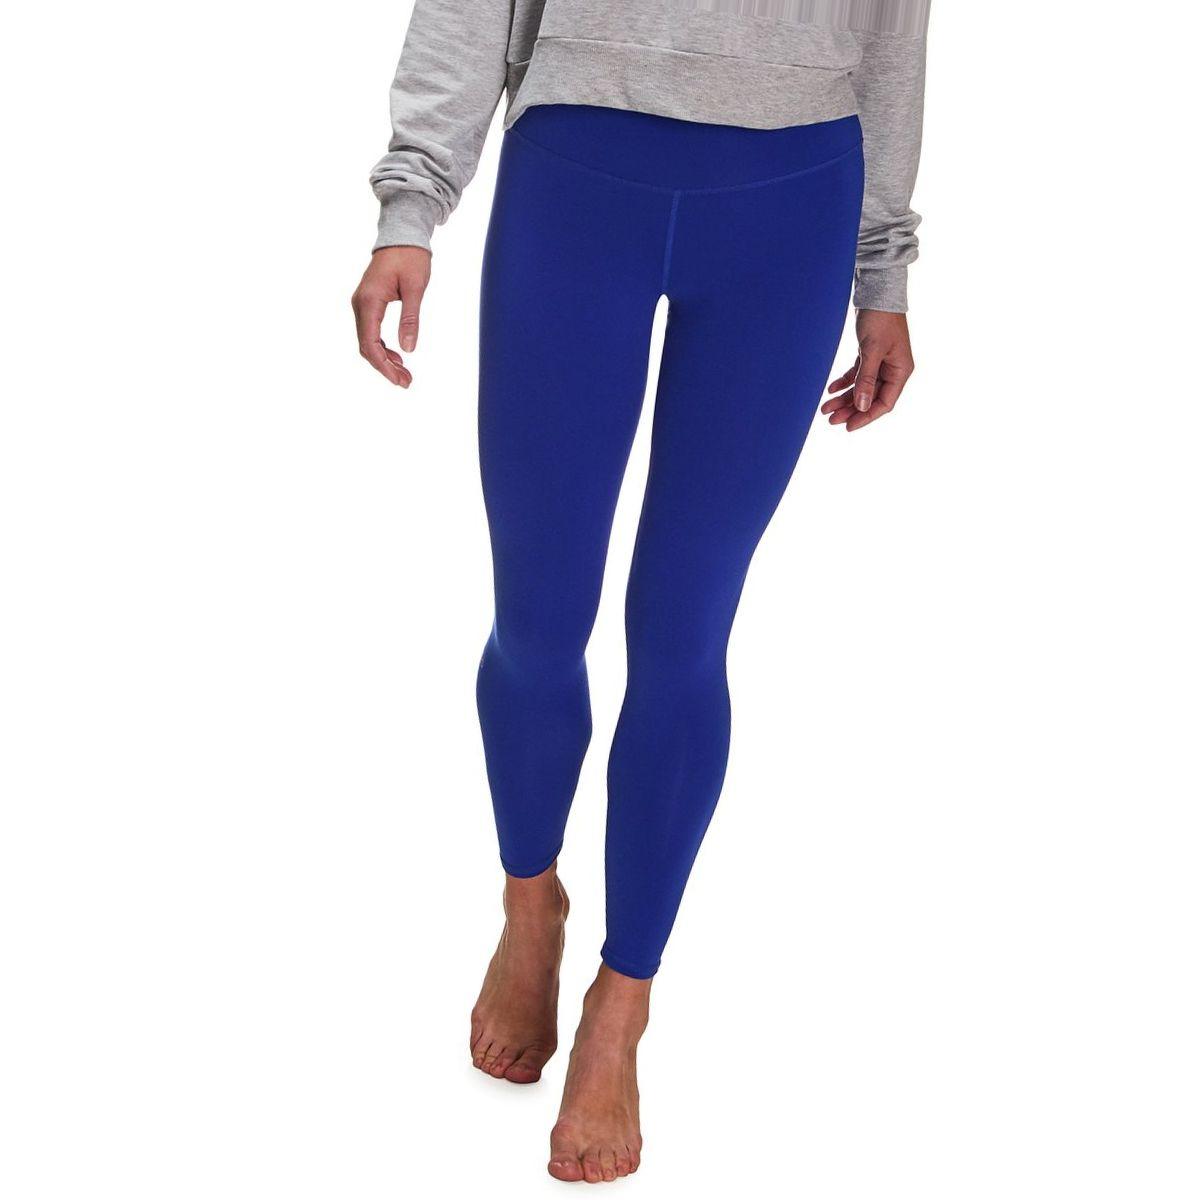 Alo Yoga 7/8 High-Waist Airbrush Legging - Women's